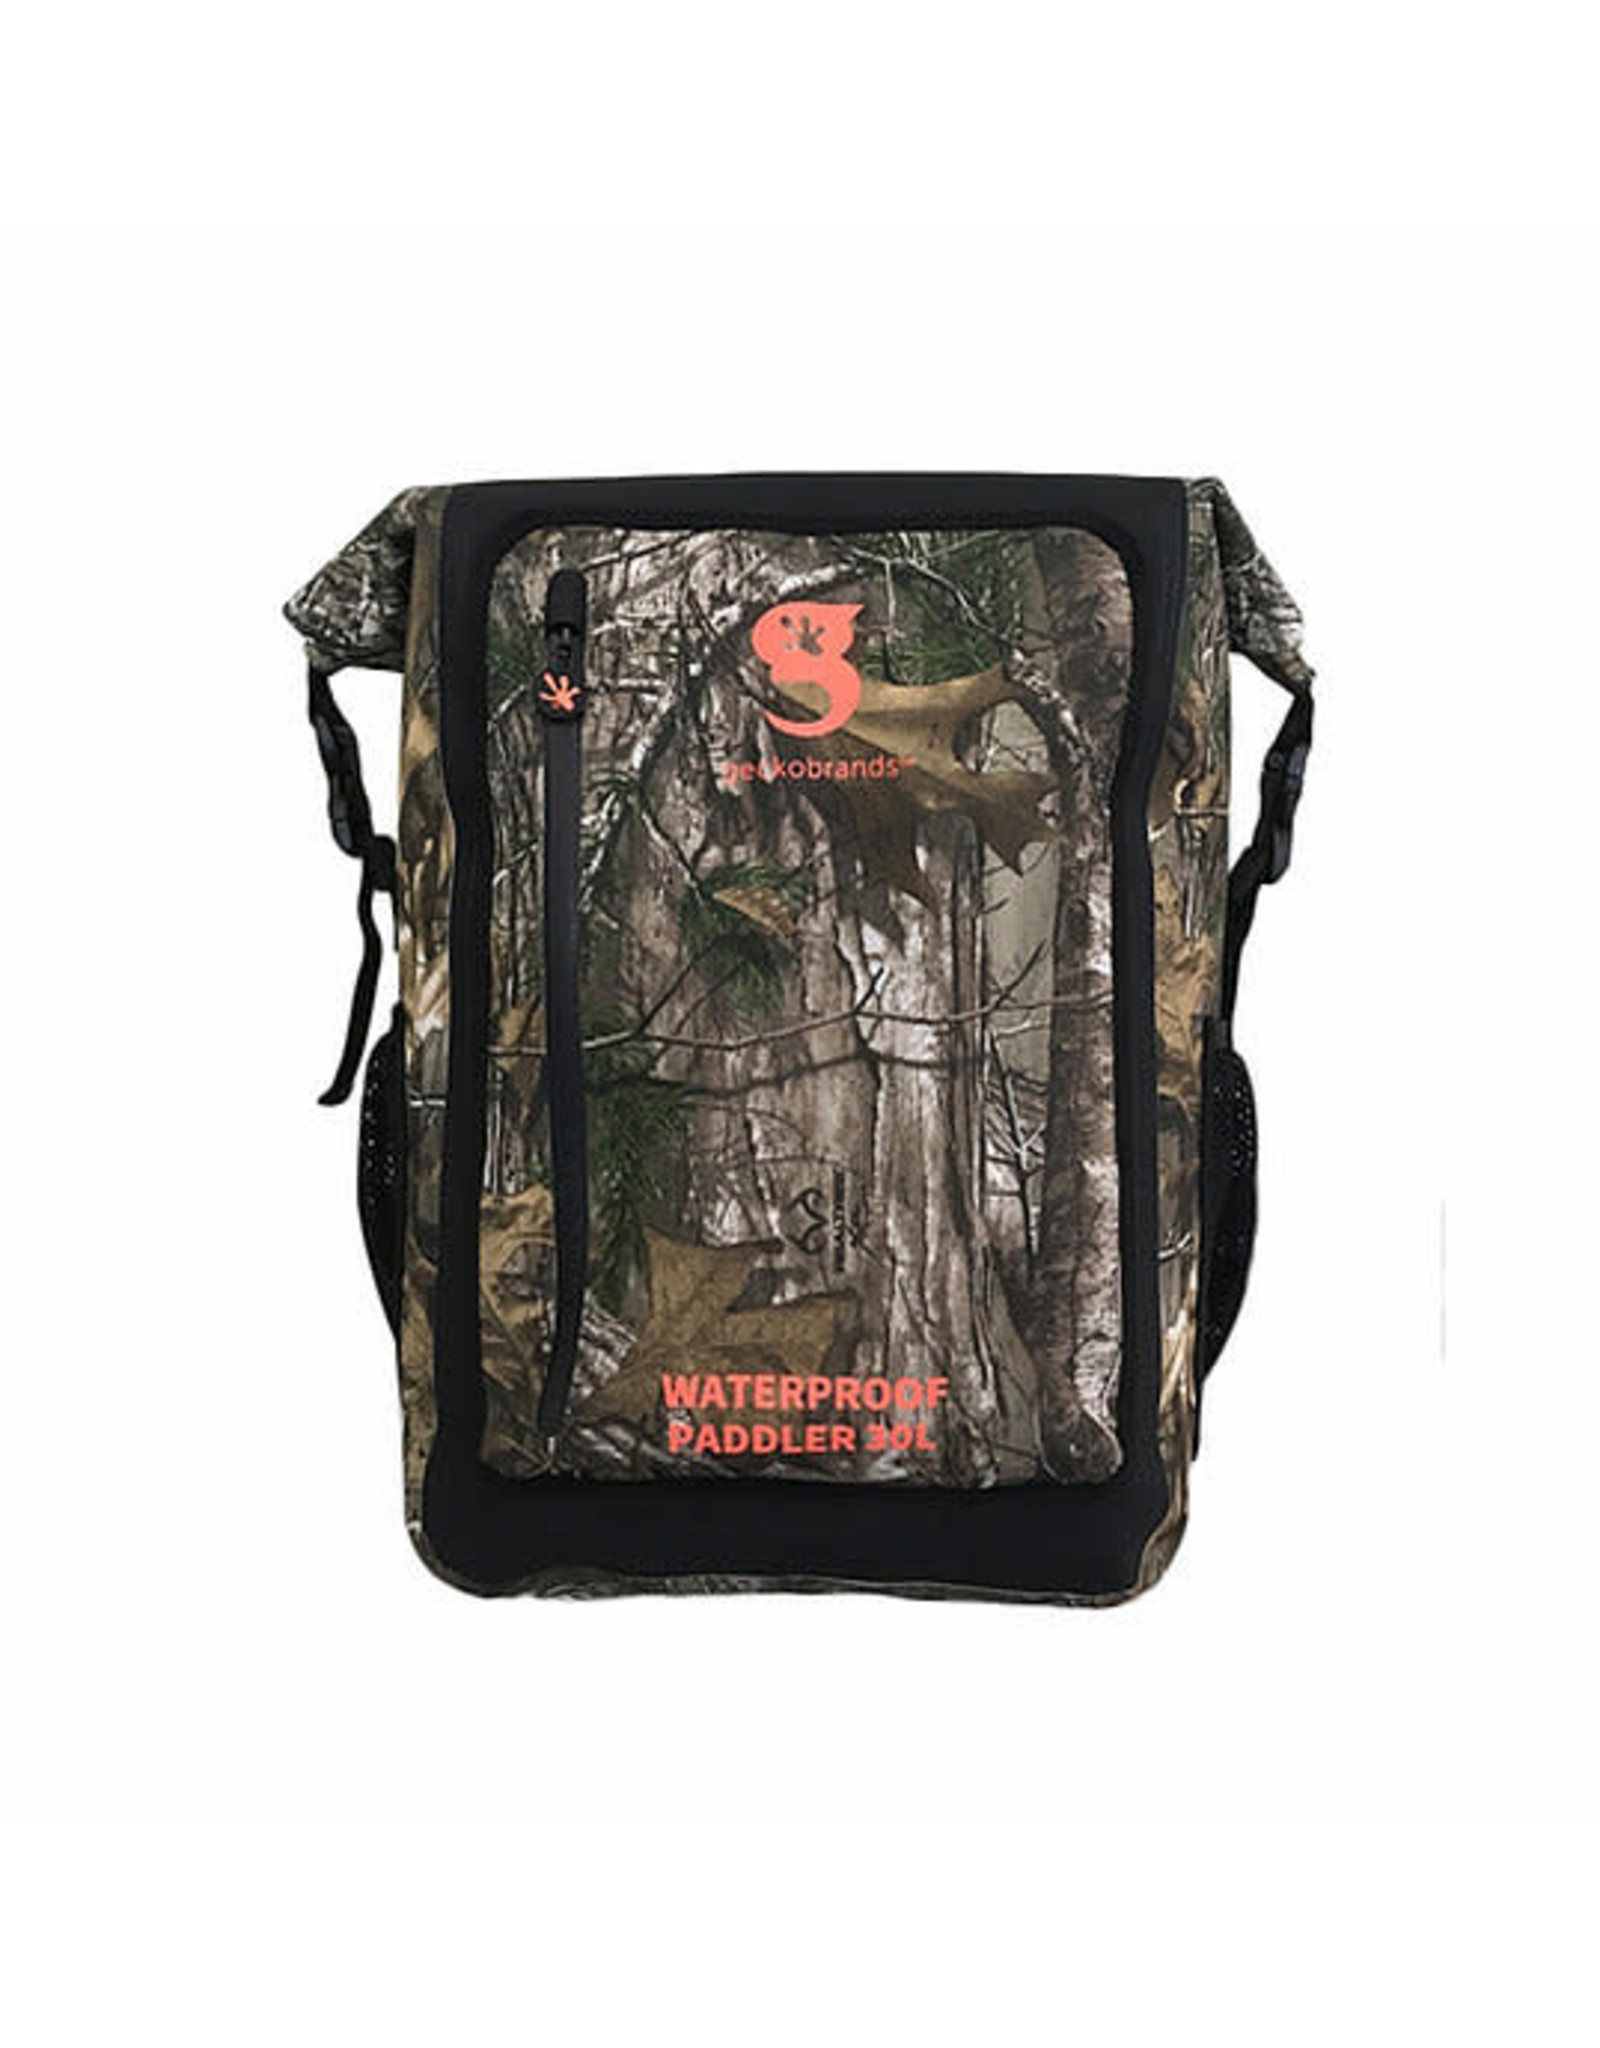 Geckobrands Paddler 30L Waterproof Backpack - Realtree Edge Camo